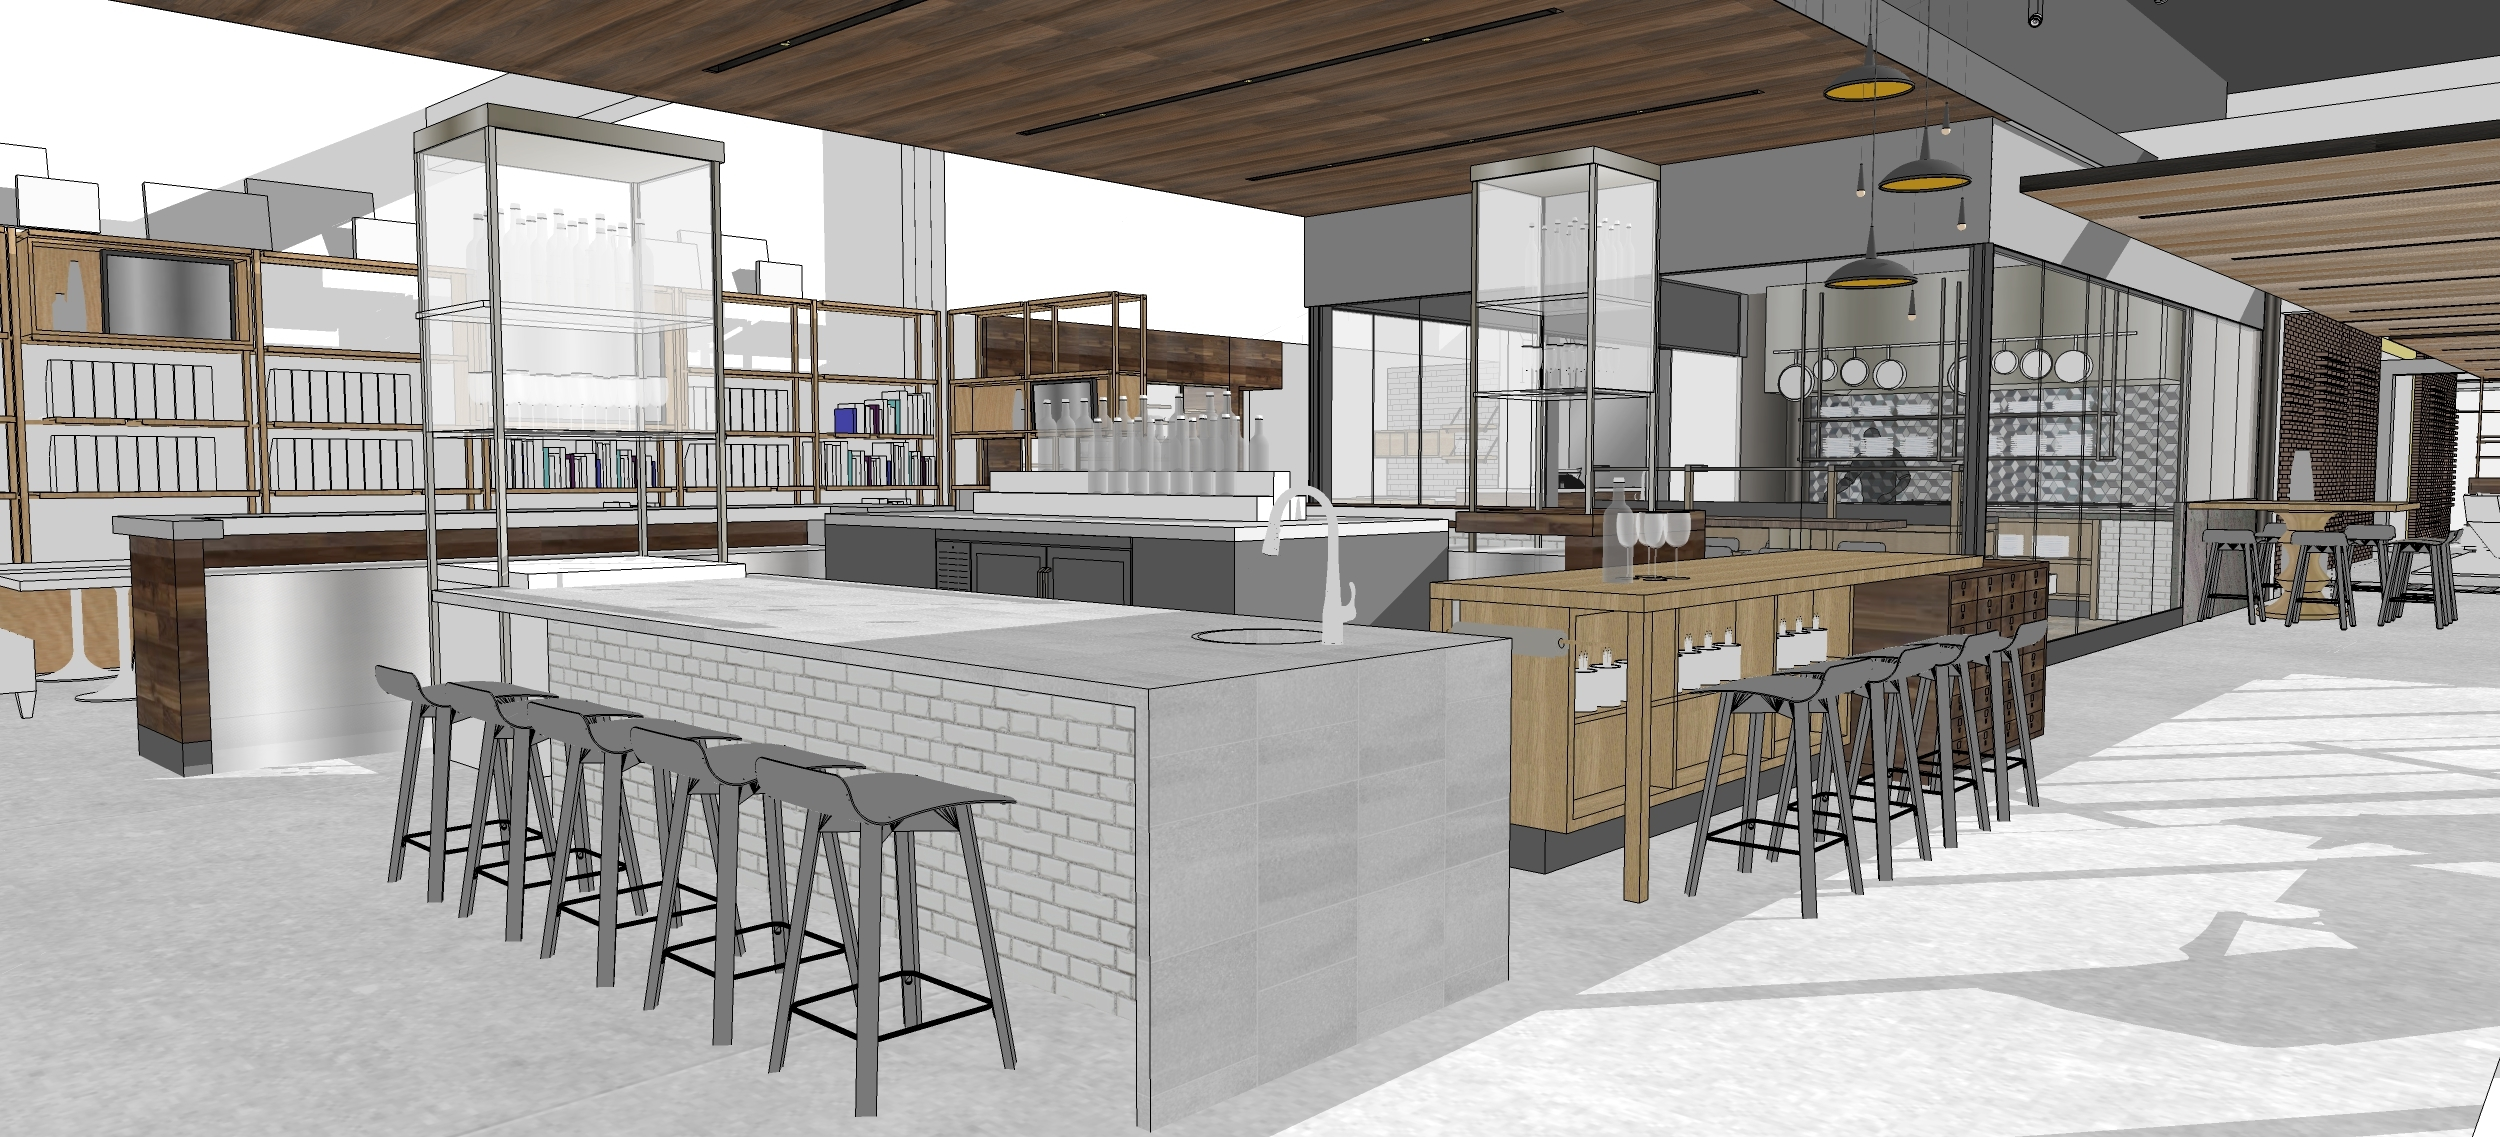 Hyatt Announces Plans For Andaz Scottsdale Resort Spa Business Wire